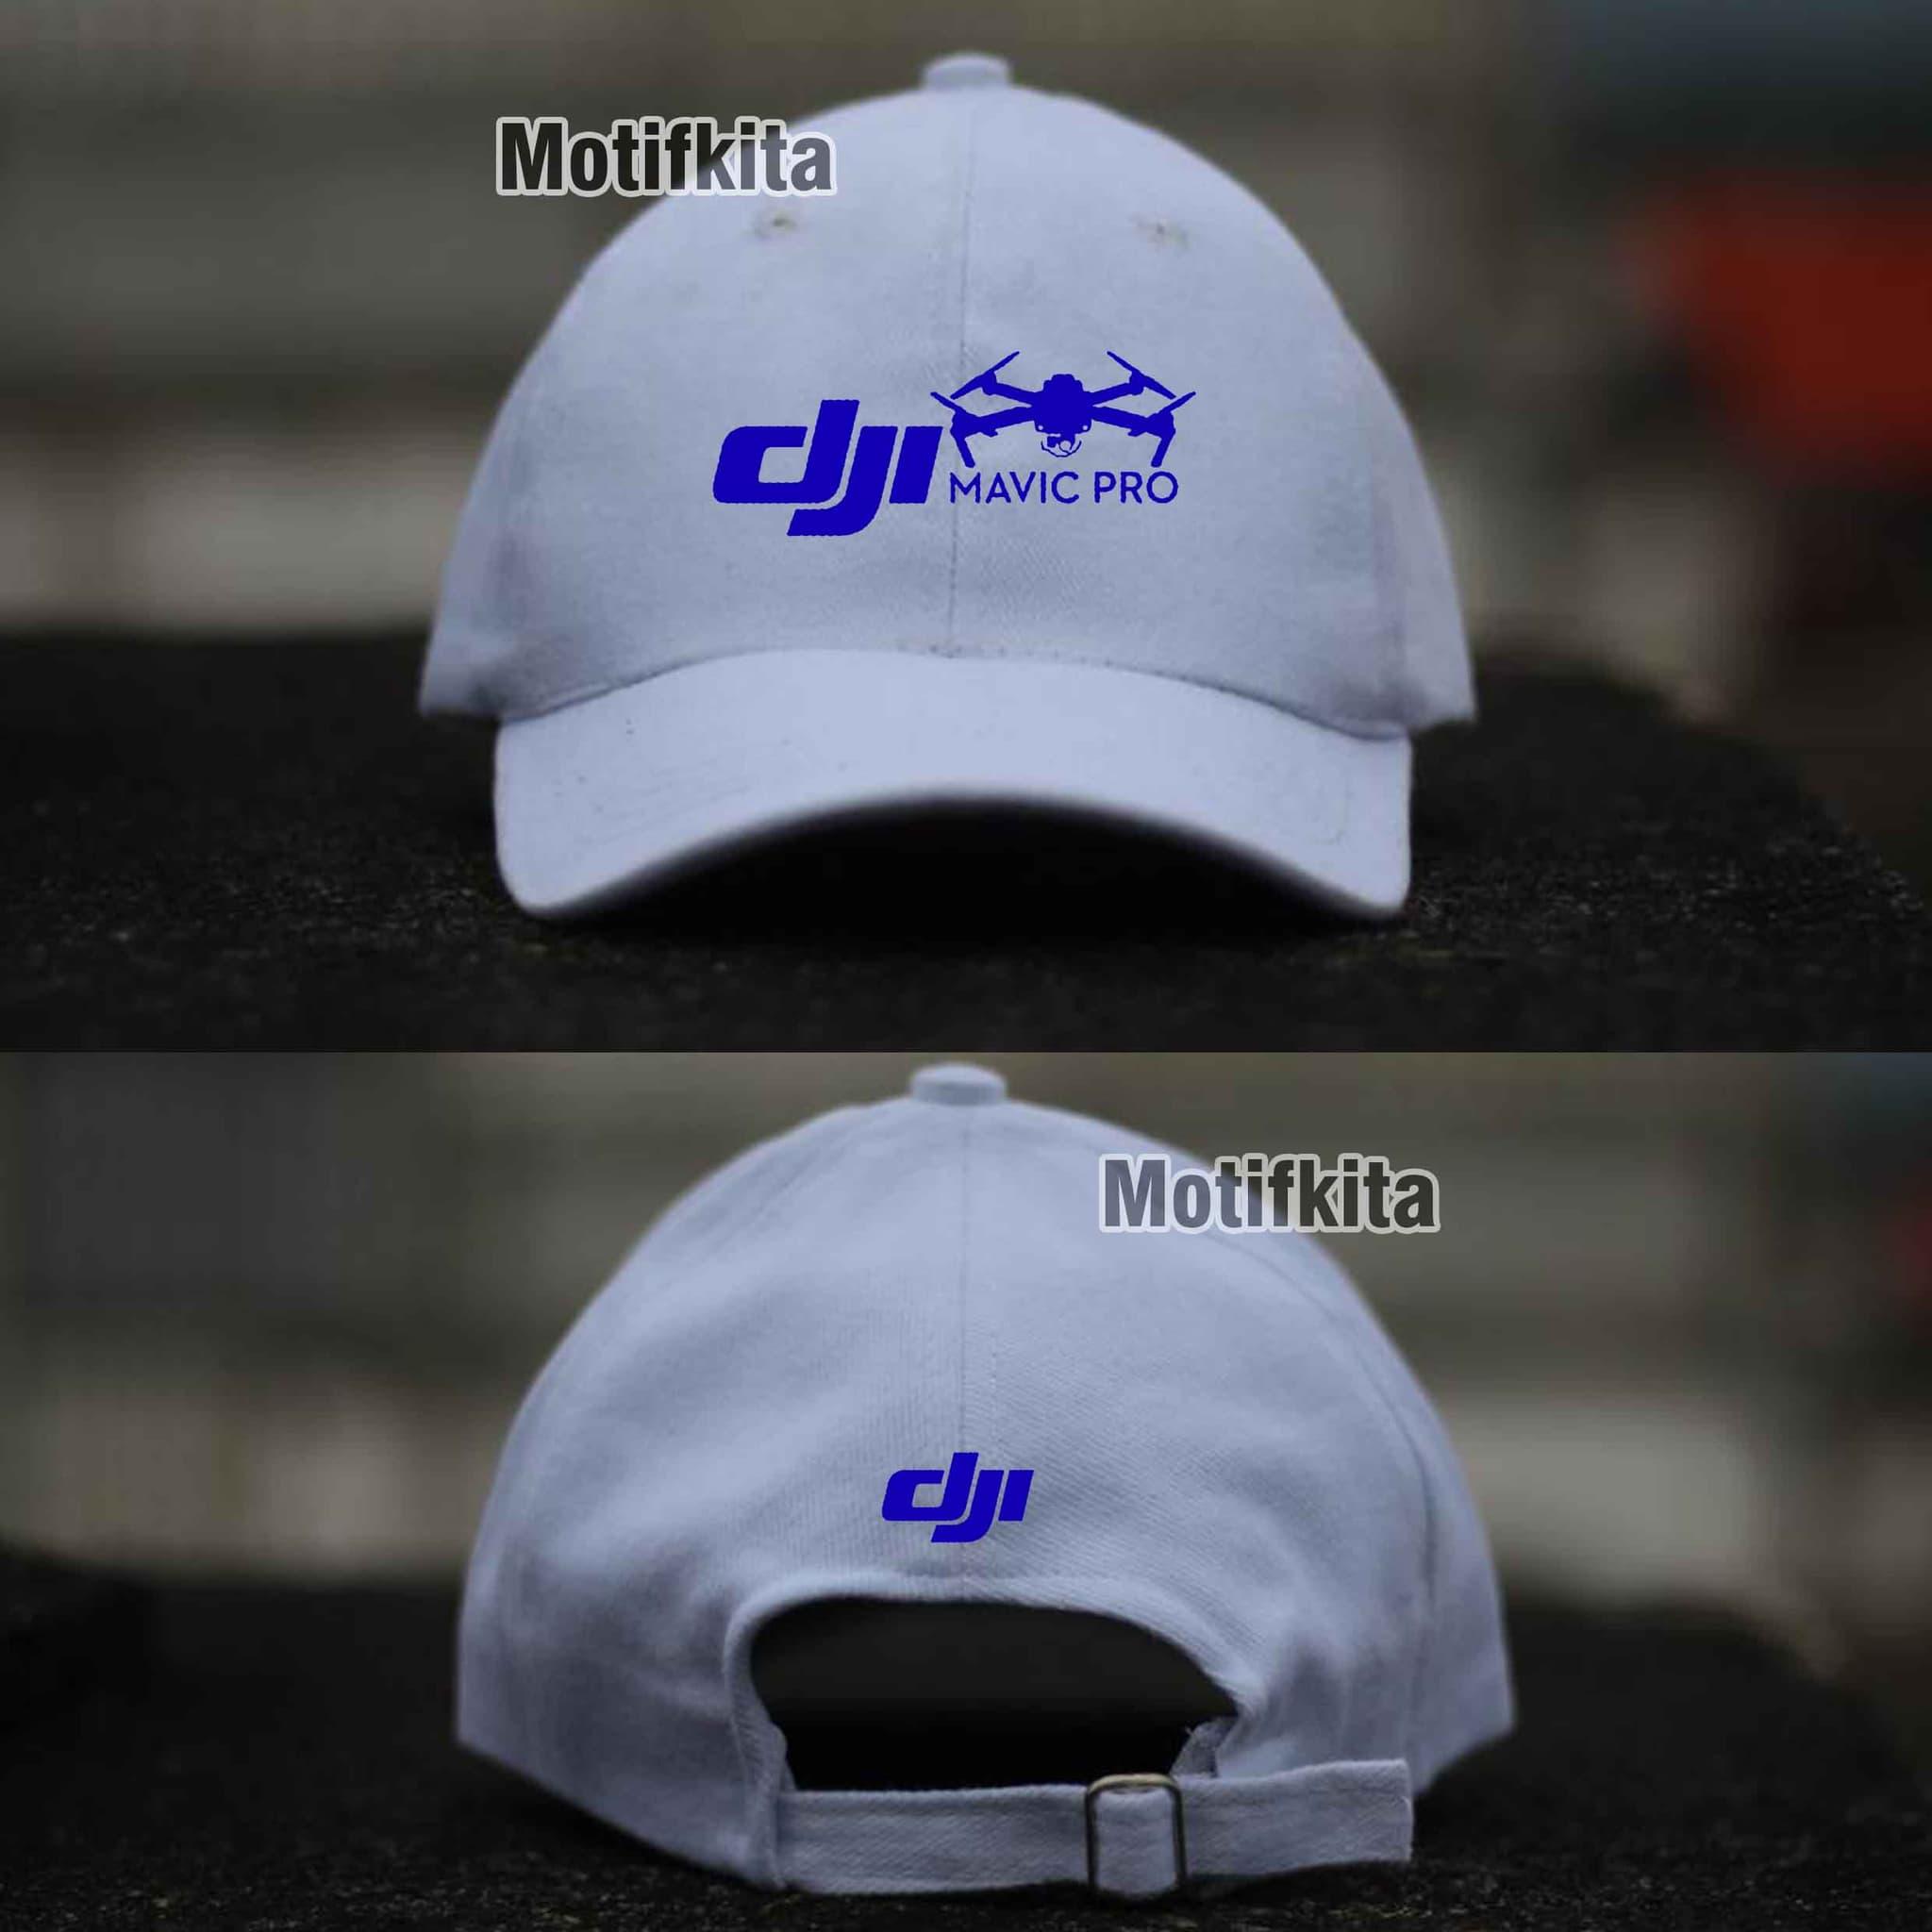 PENAWARAN Topi Baseball DJI MAVIC PRO putih keren Costumerch 05e9801d8c